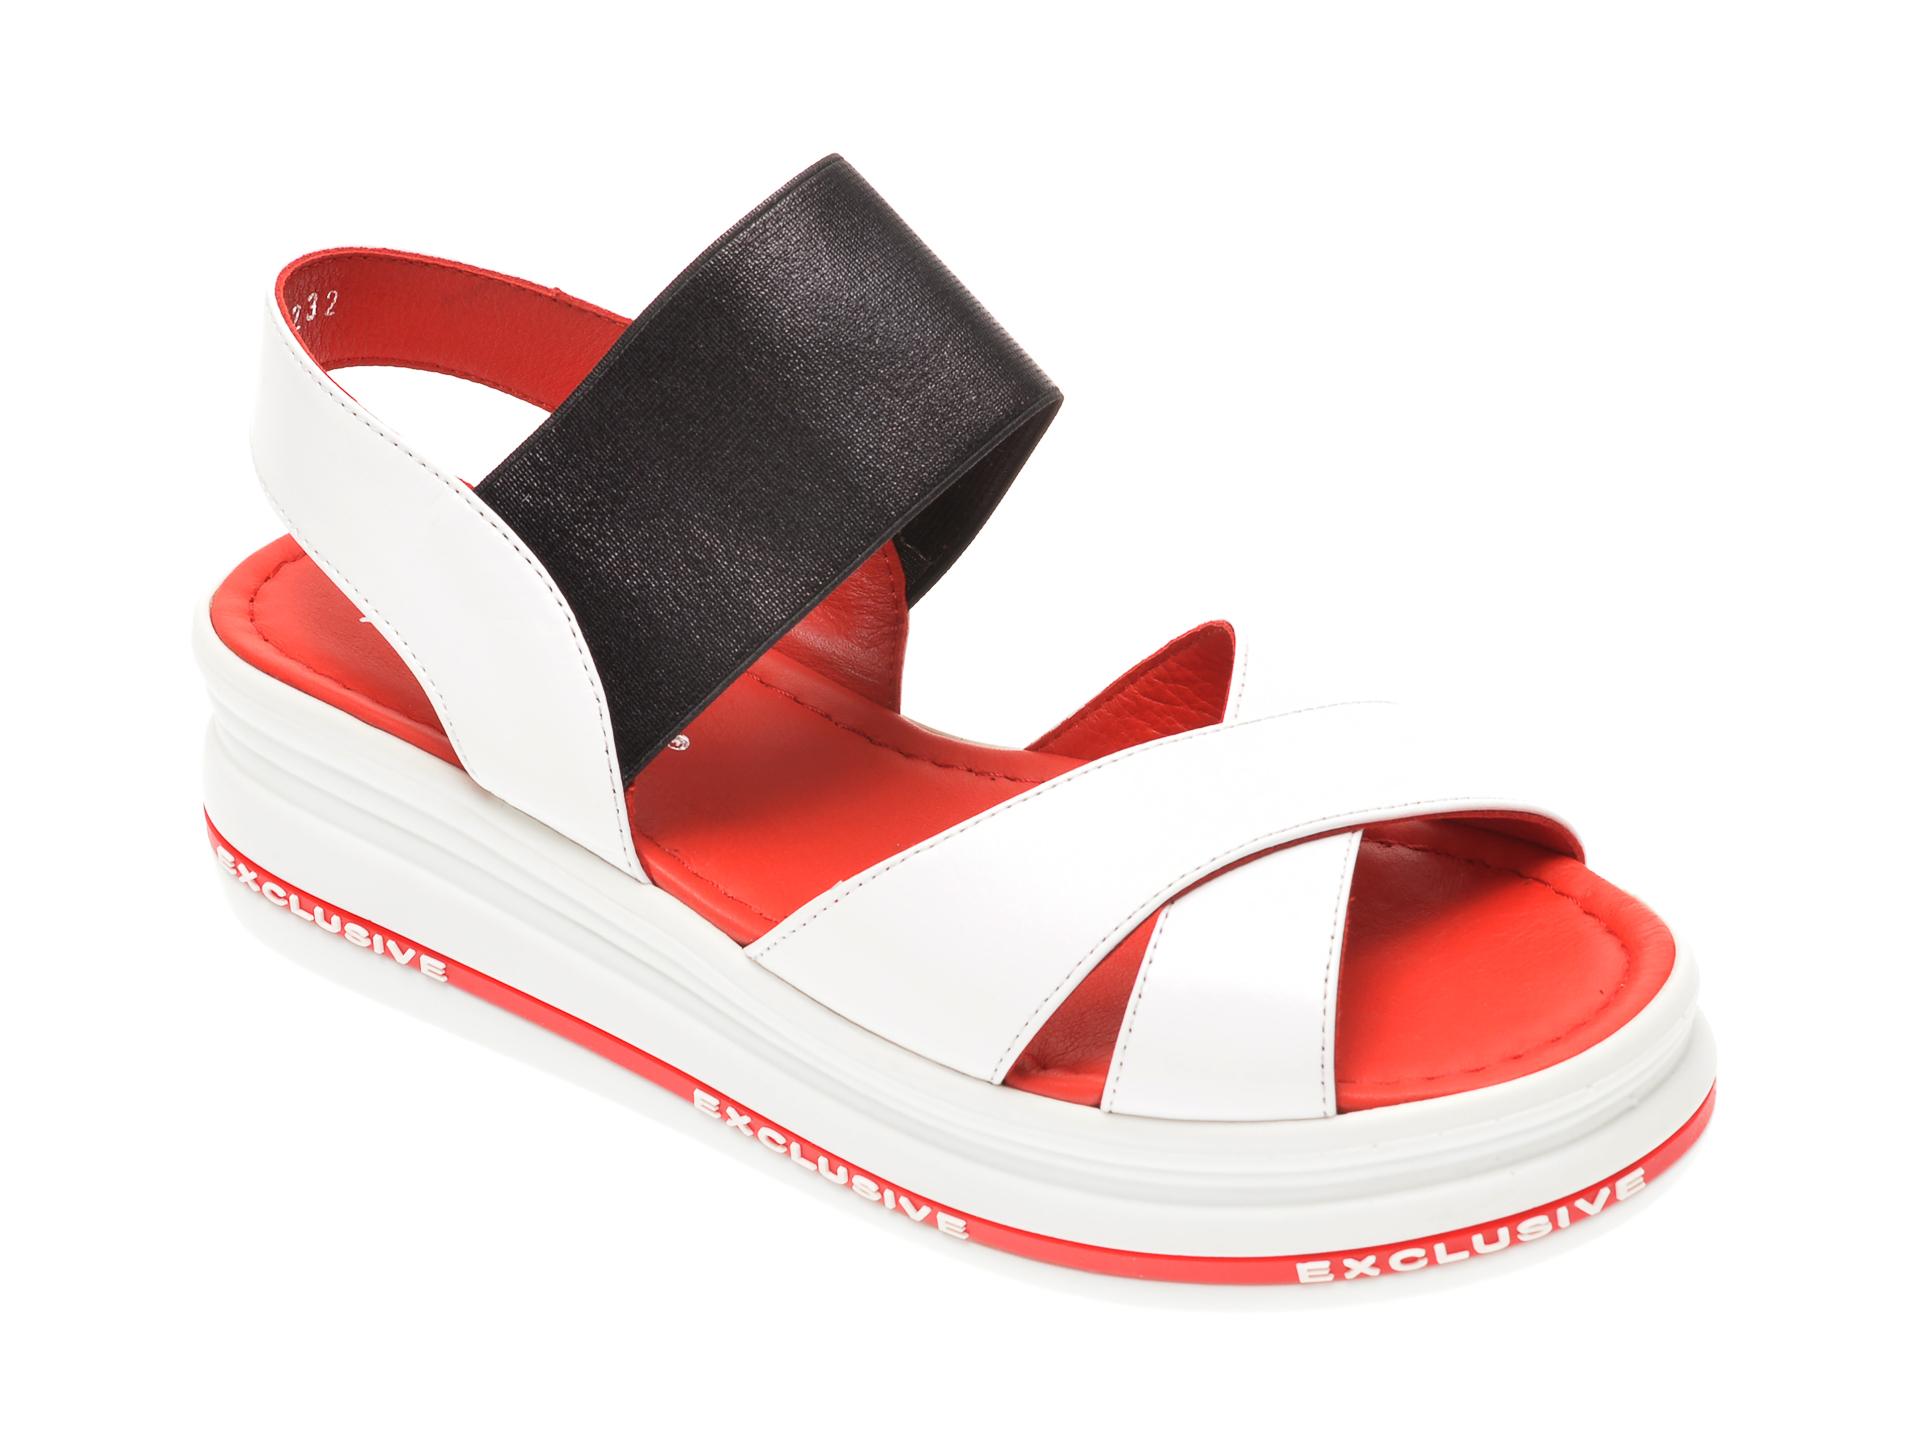 Sandale MISS LIZA albe, 1182303, din piele naturala